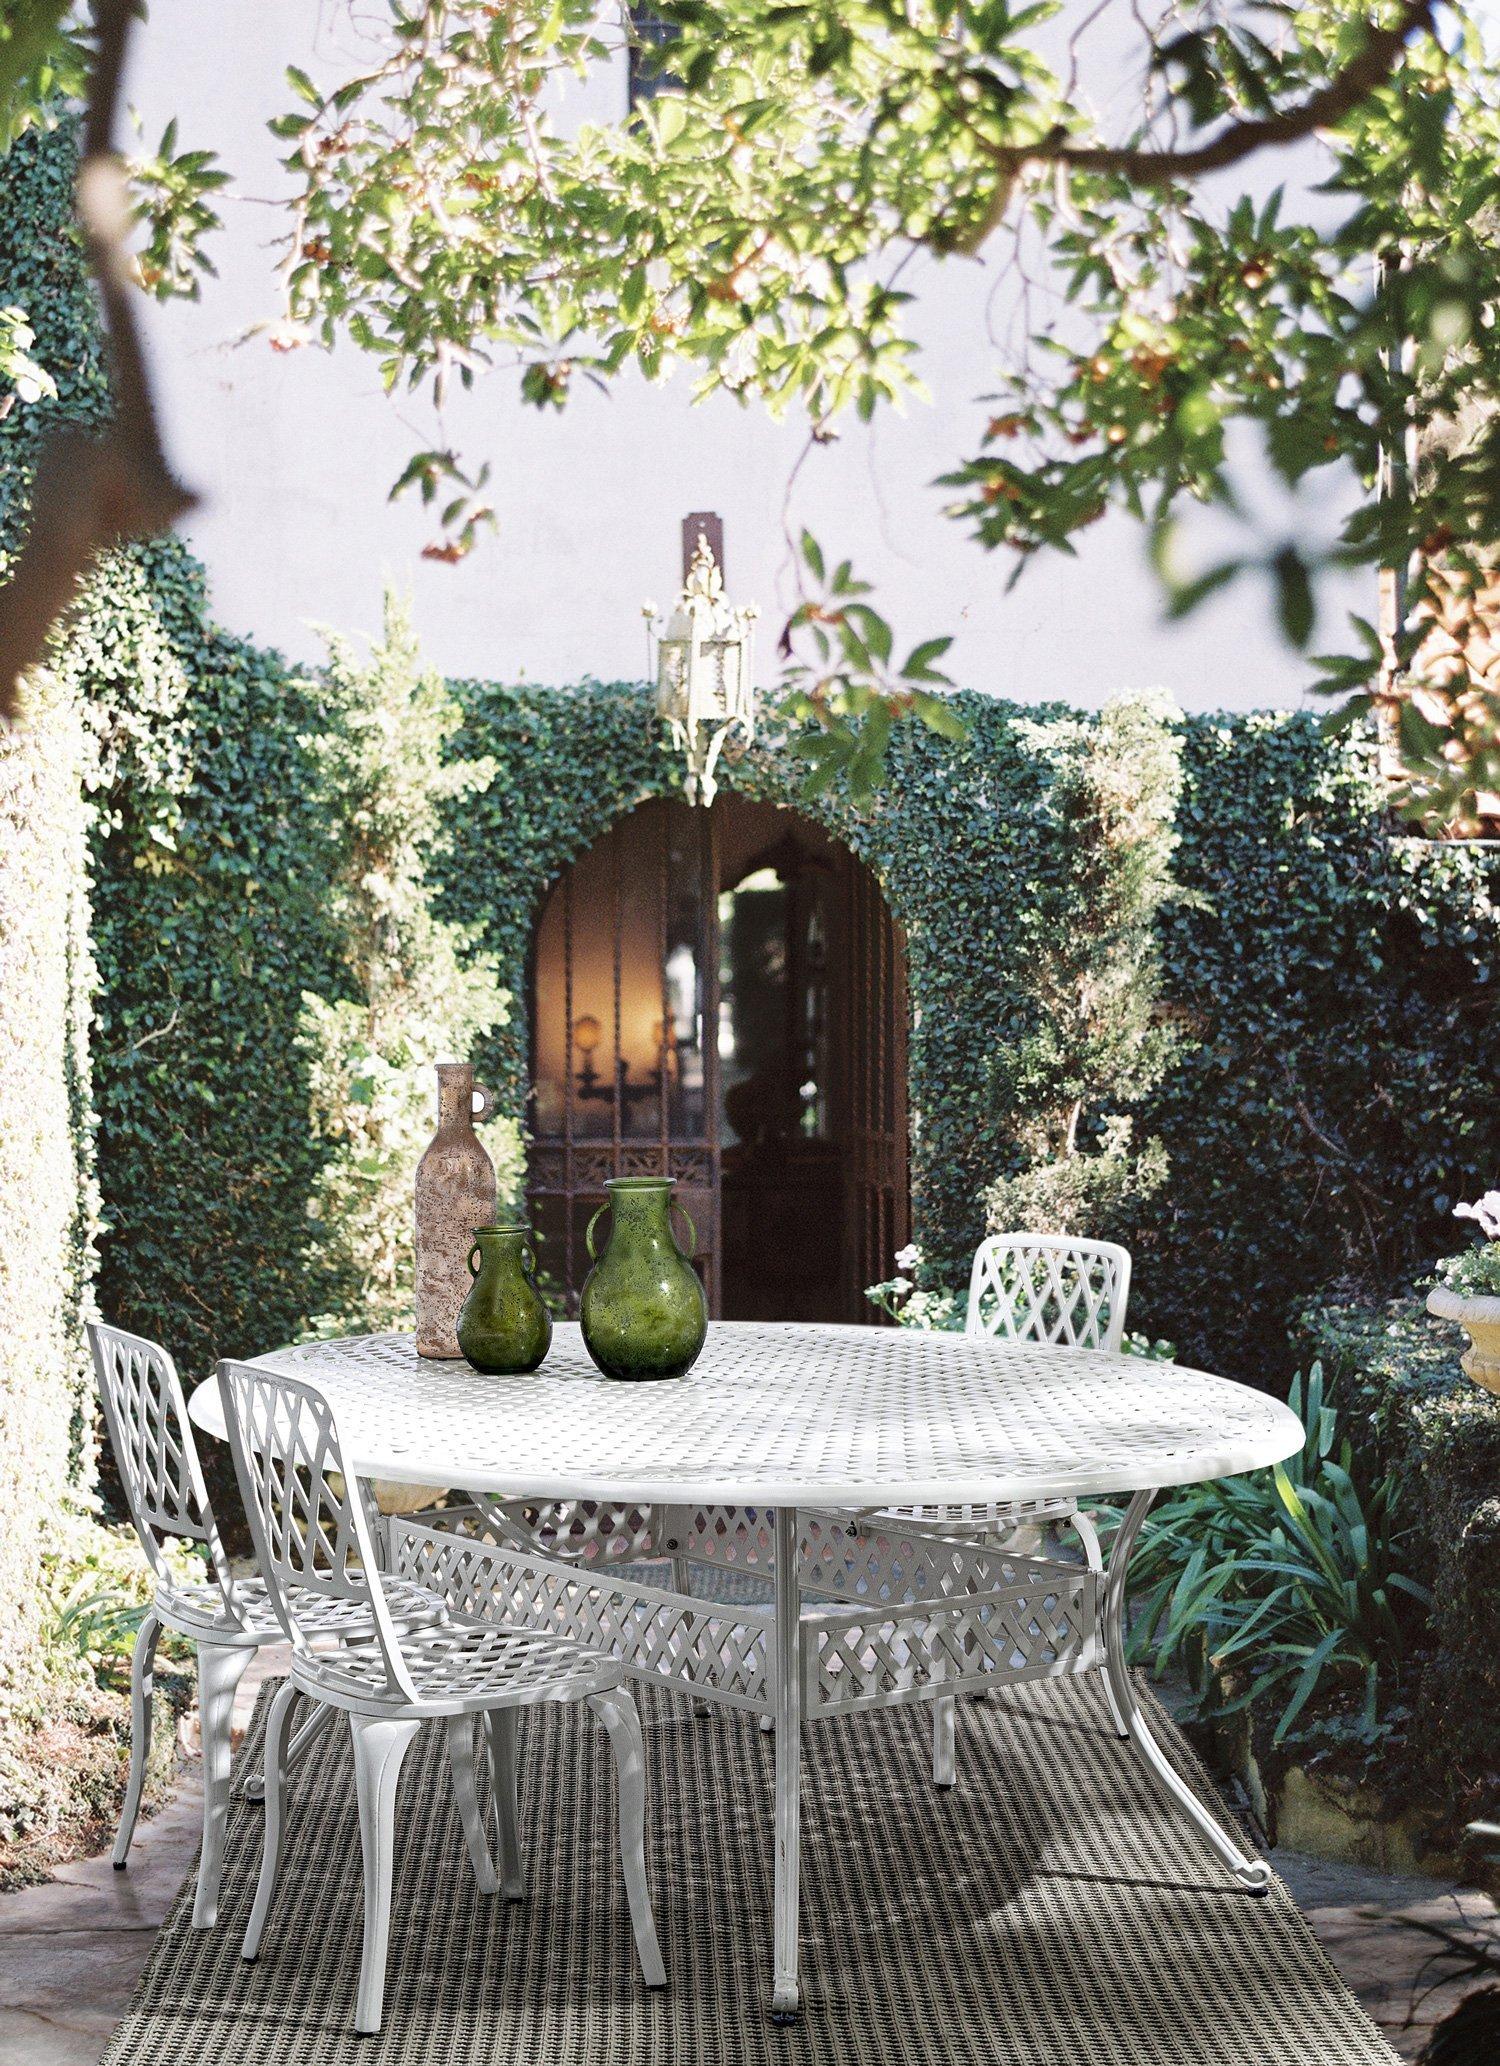 Set per giardino Bizzotto - Sedie Faenza - Tavolo Ivrea